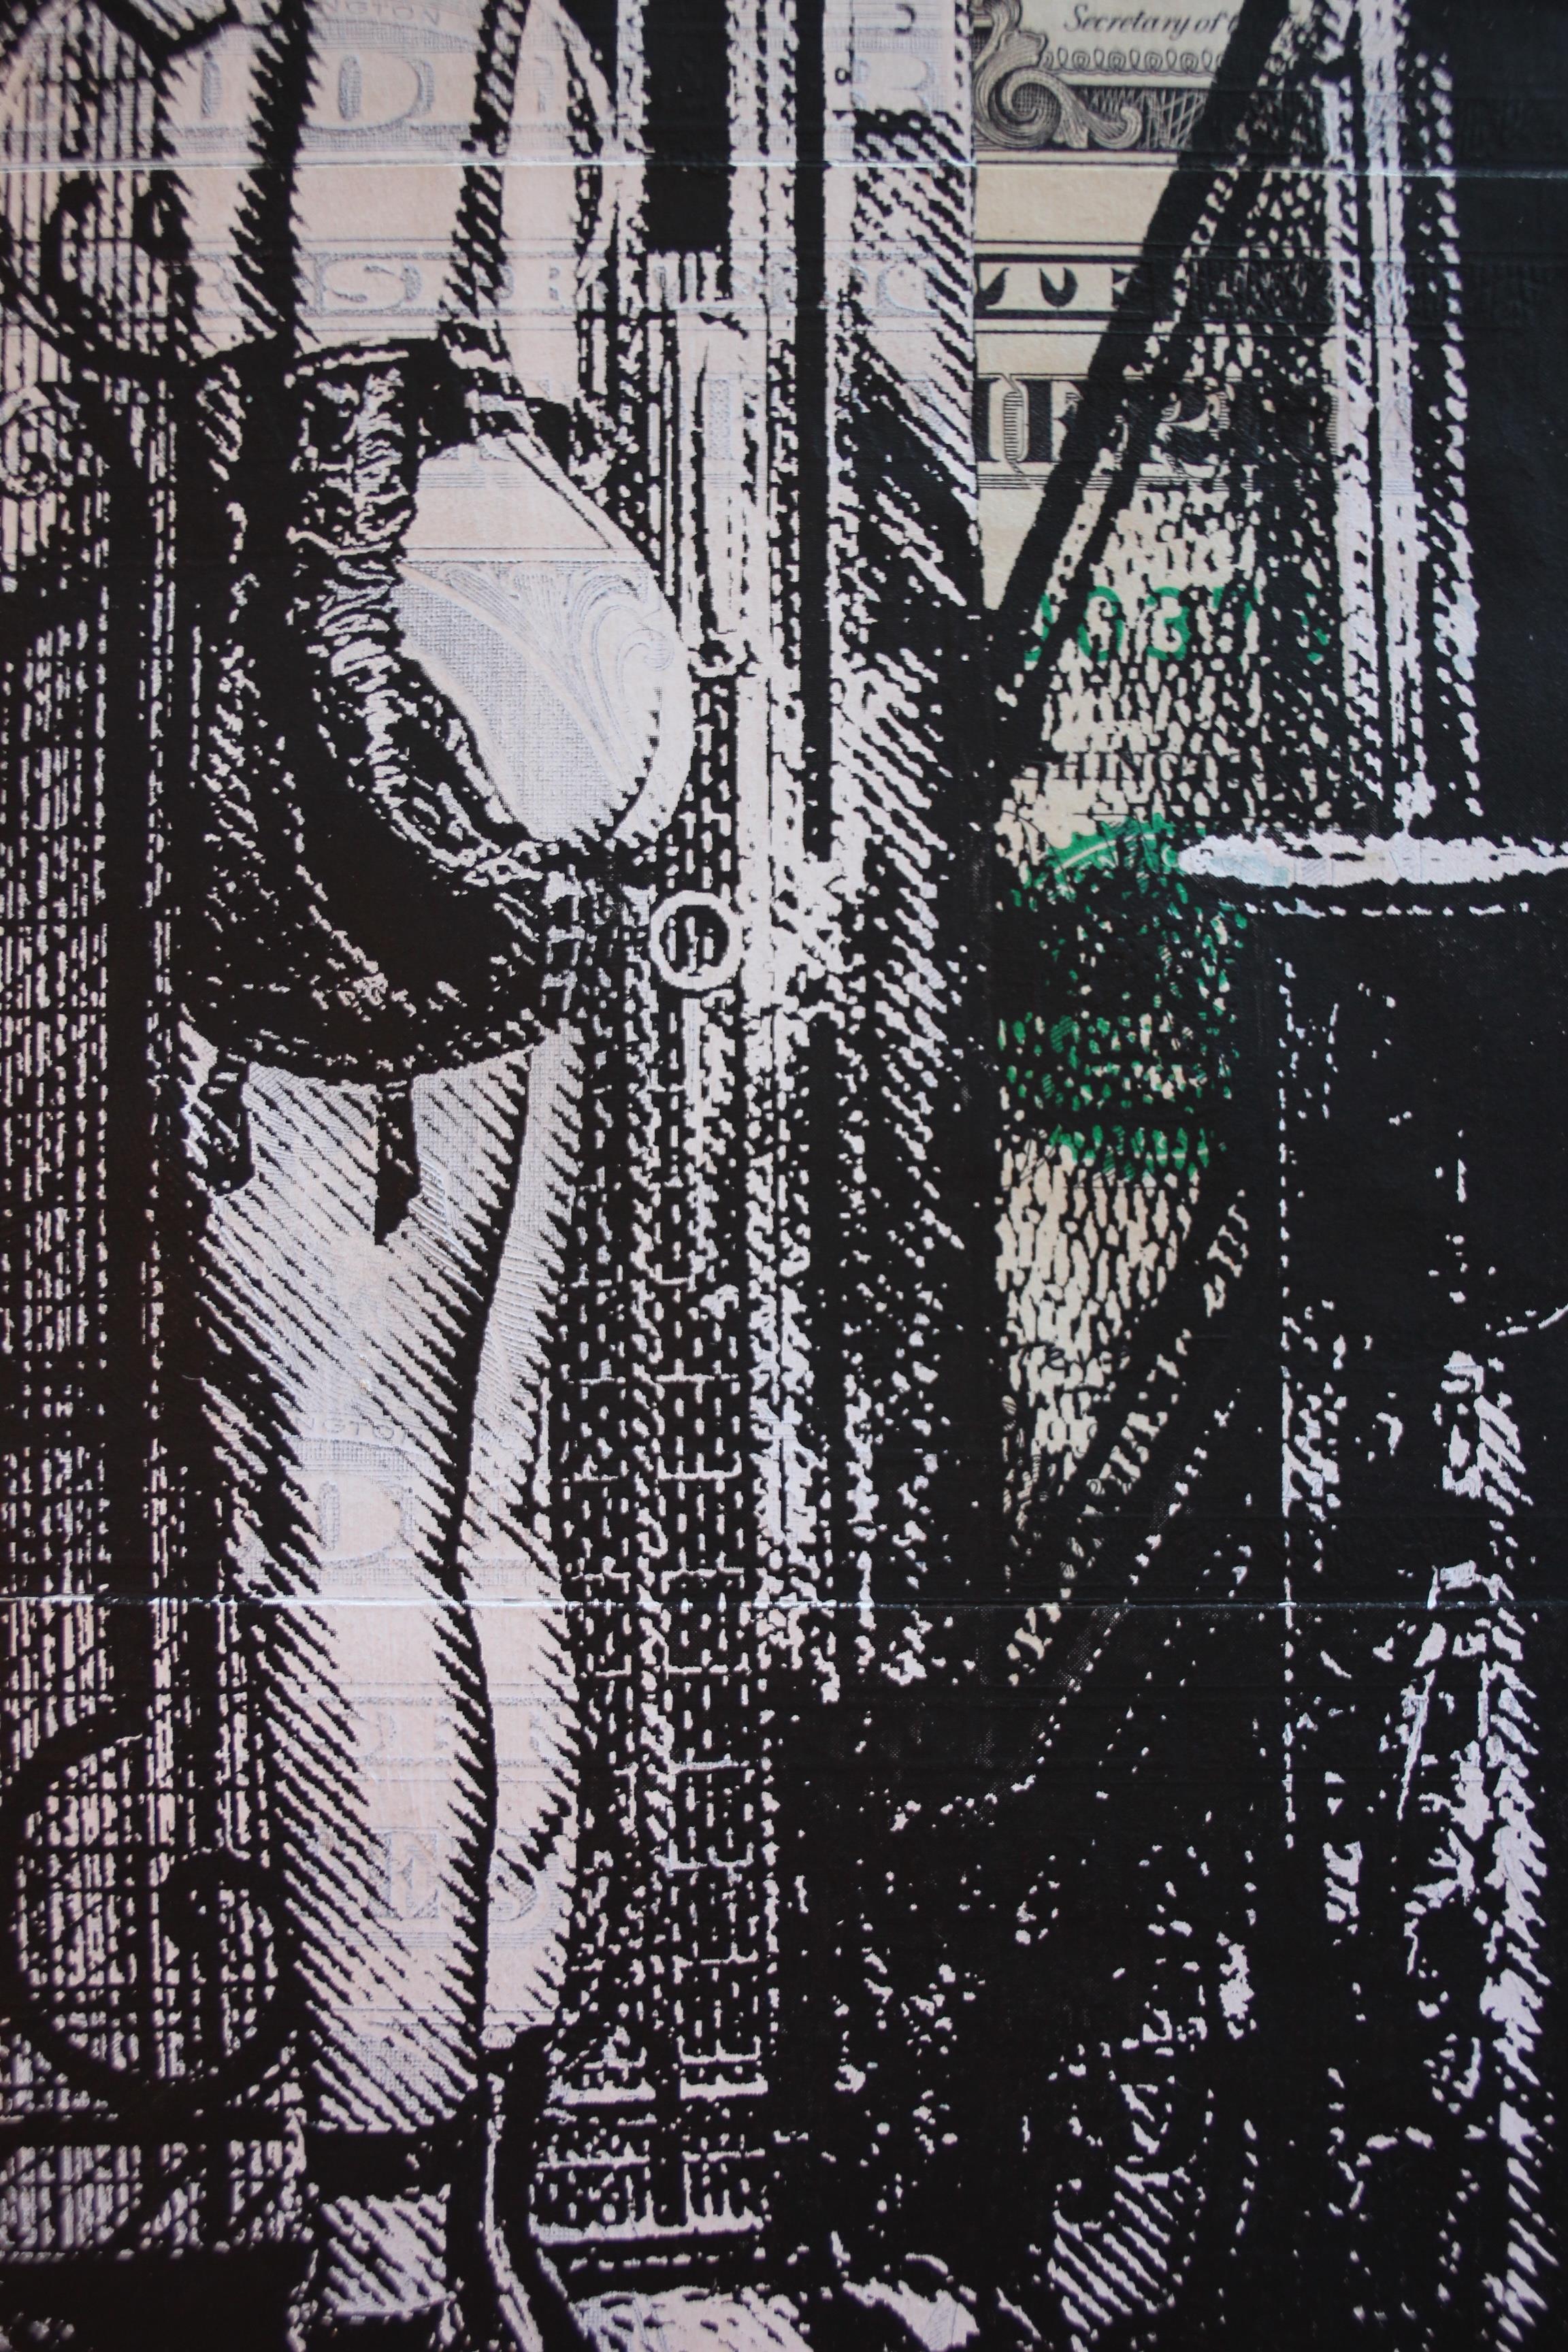 CHRISTOPHER HENRY 'ASCENSEUR PARISIEN ' - 2021 - Image 3 of 5